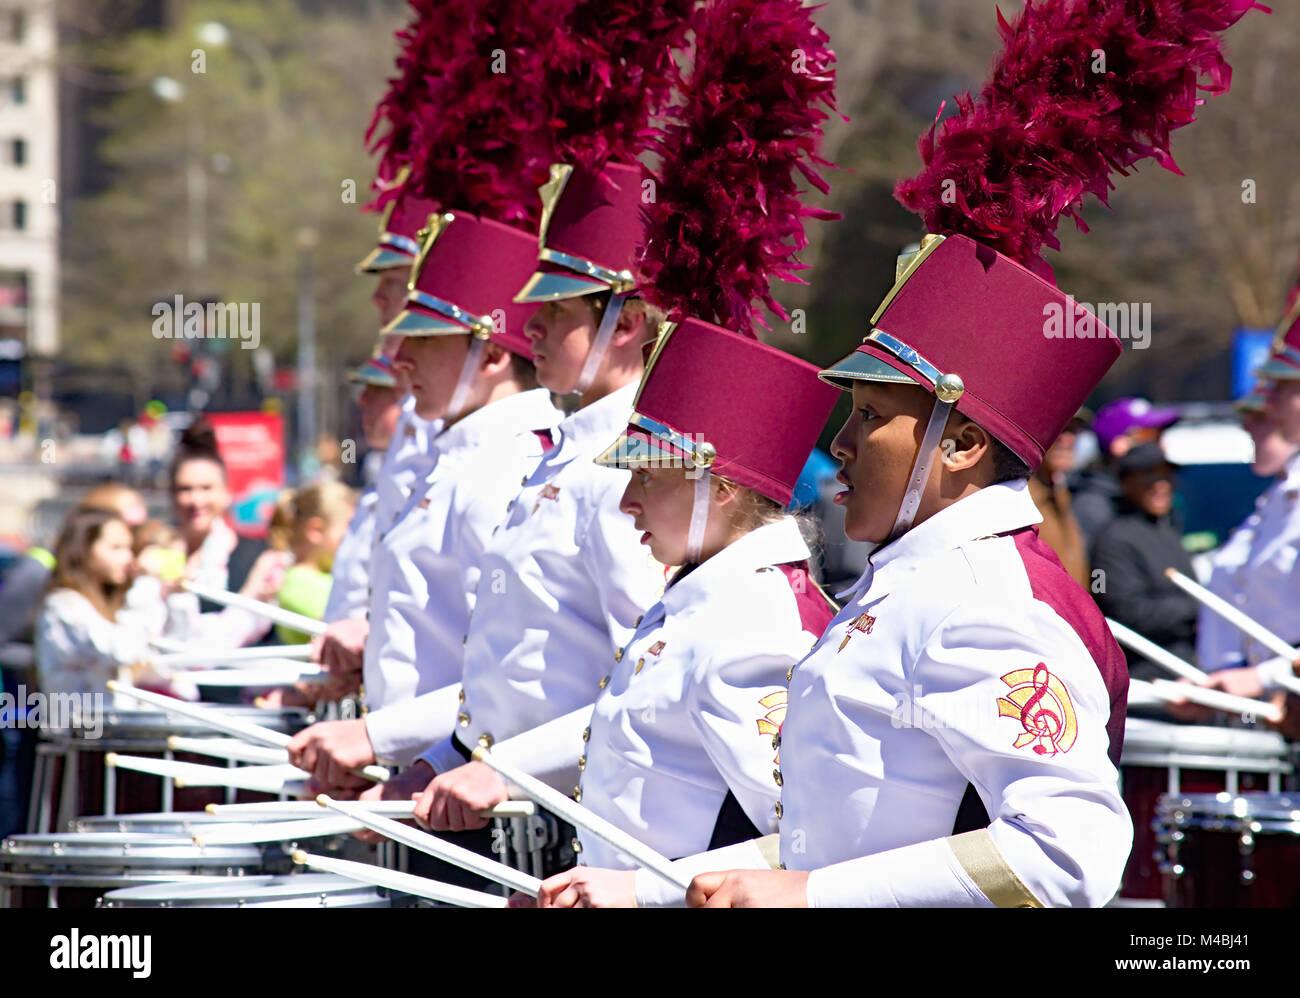 From Marietta Georgia The Lassiter High School marching Trojan band - Stock Image